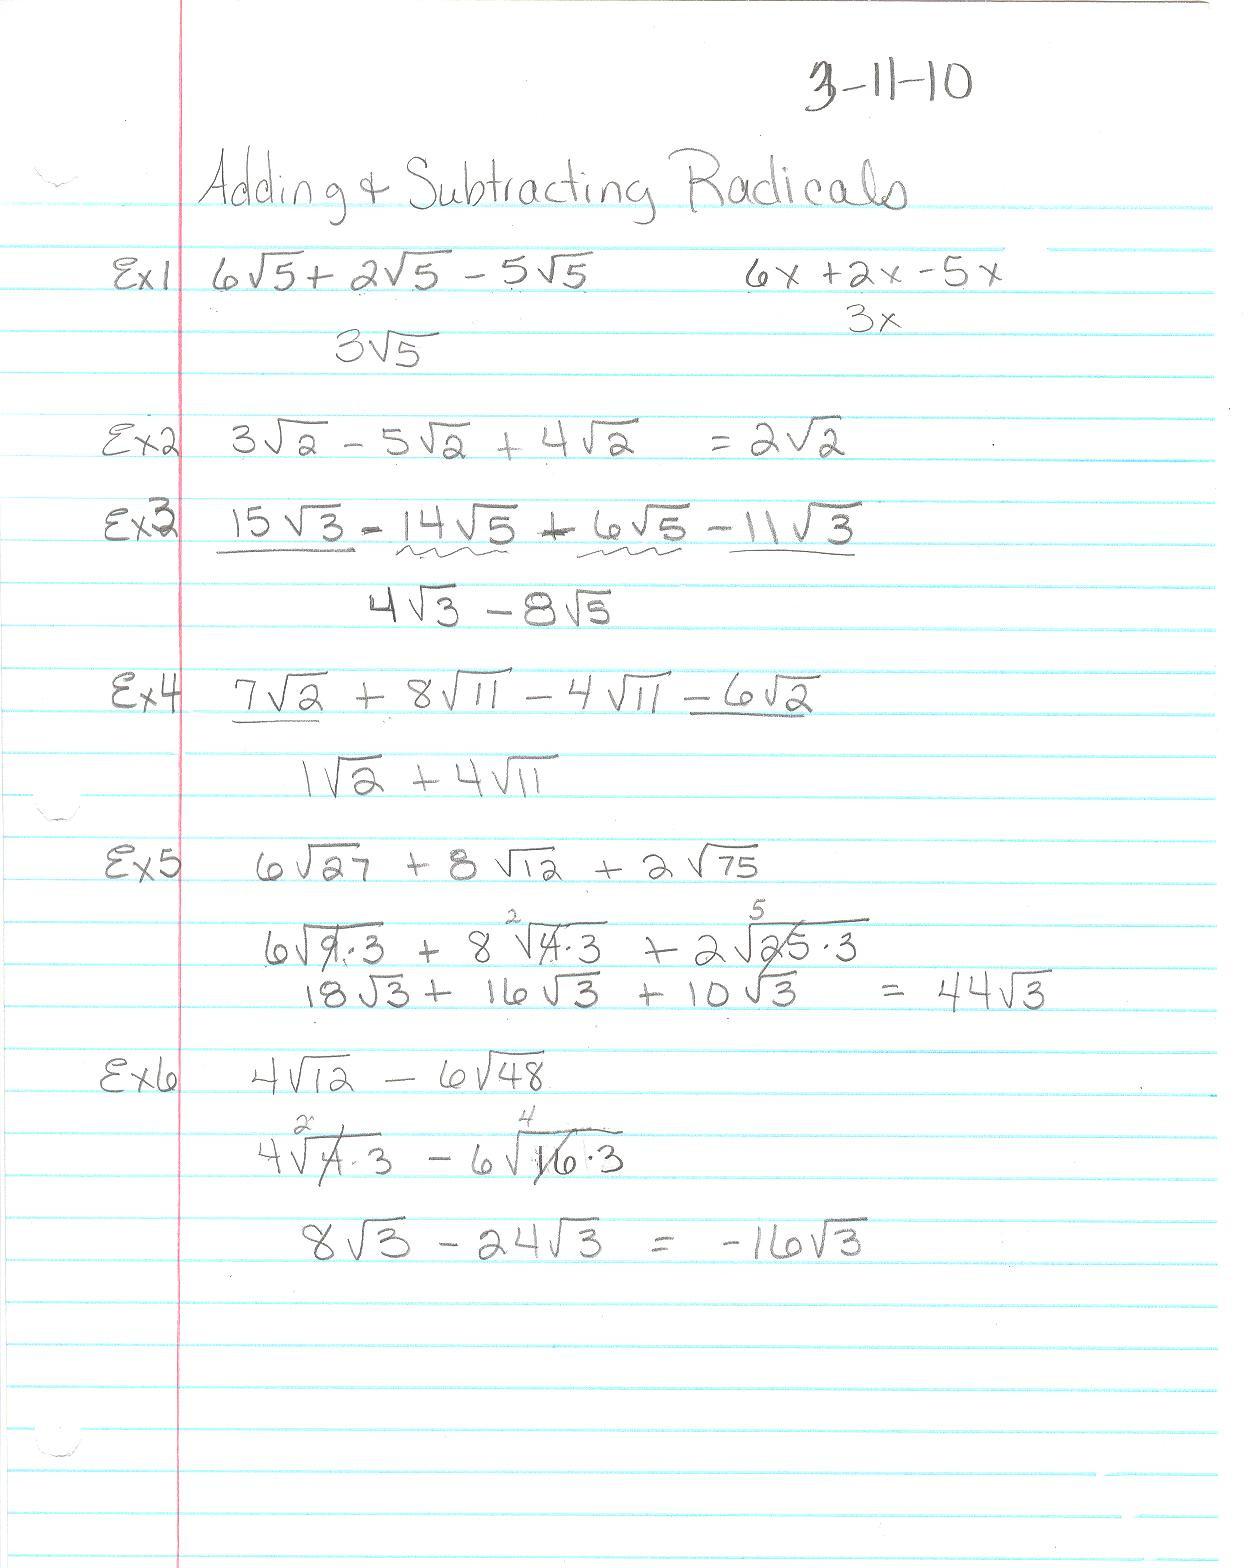 Adding and Subtracting Radicals Worksheet Adding Radicals Worksheet